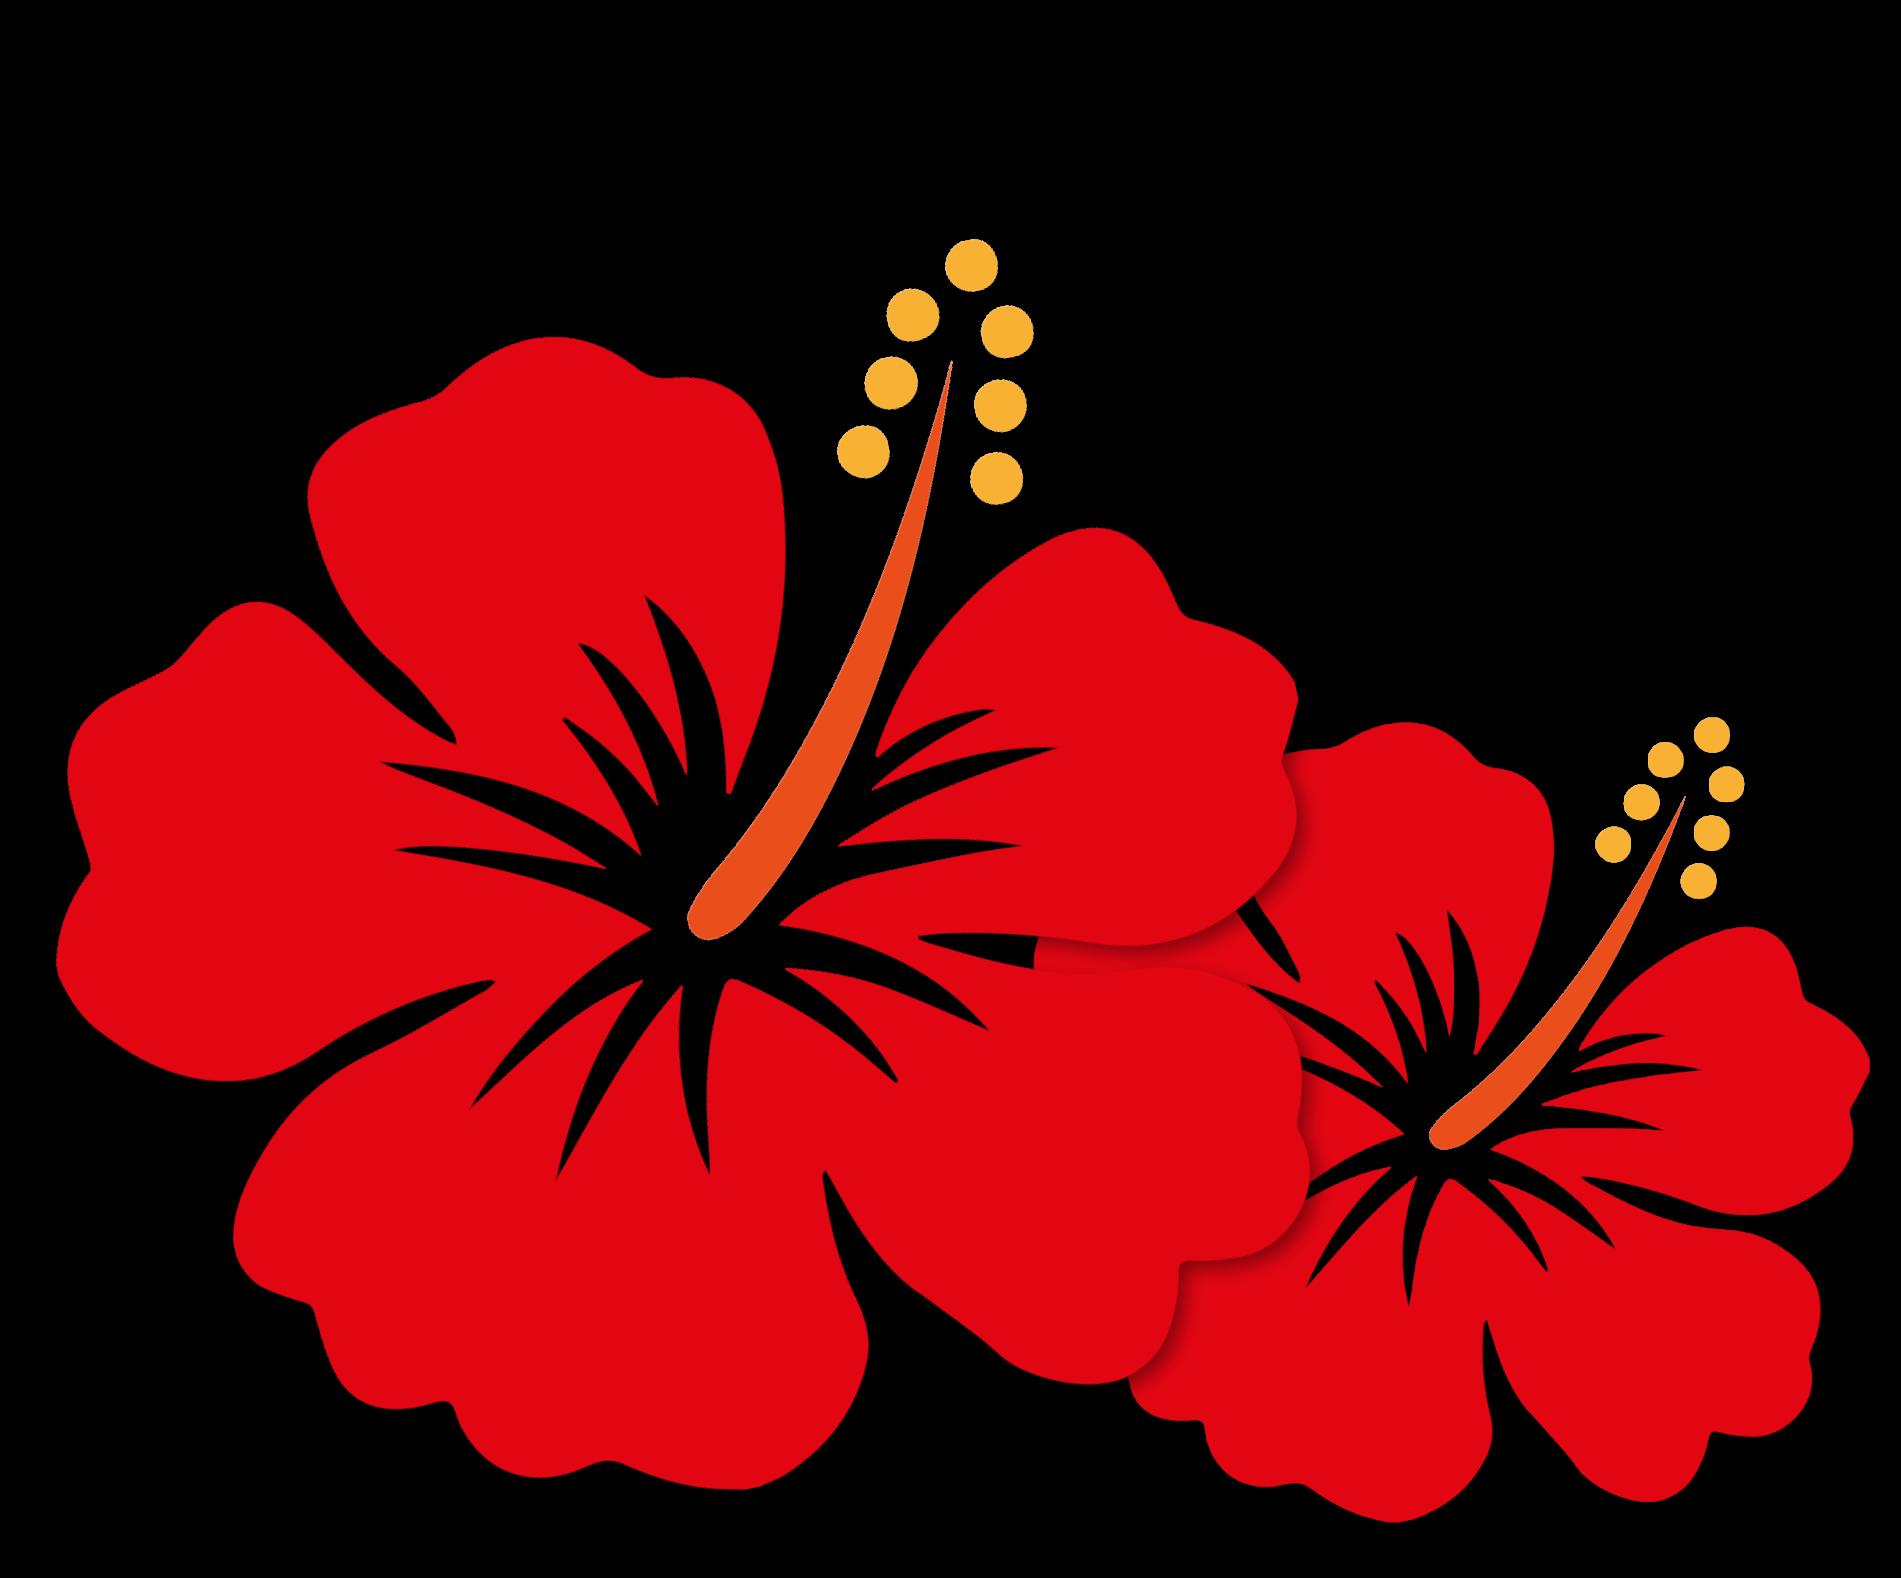 Menakjubkan 30 Lukisan Gambar Bunga Raya Kartun Arti Gambar